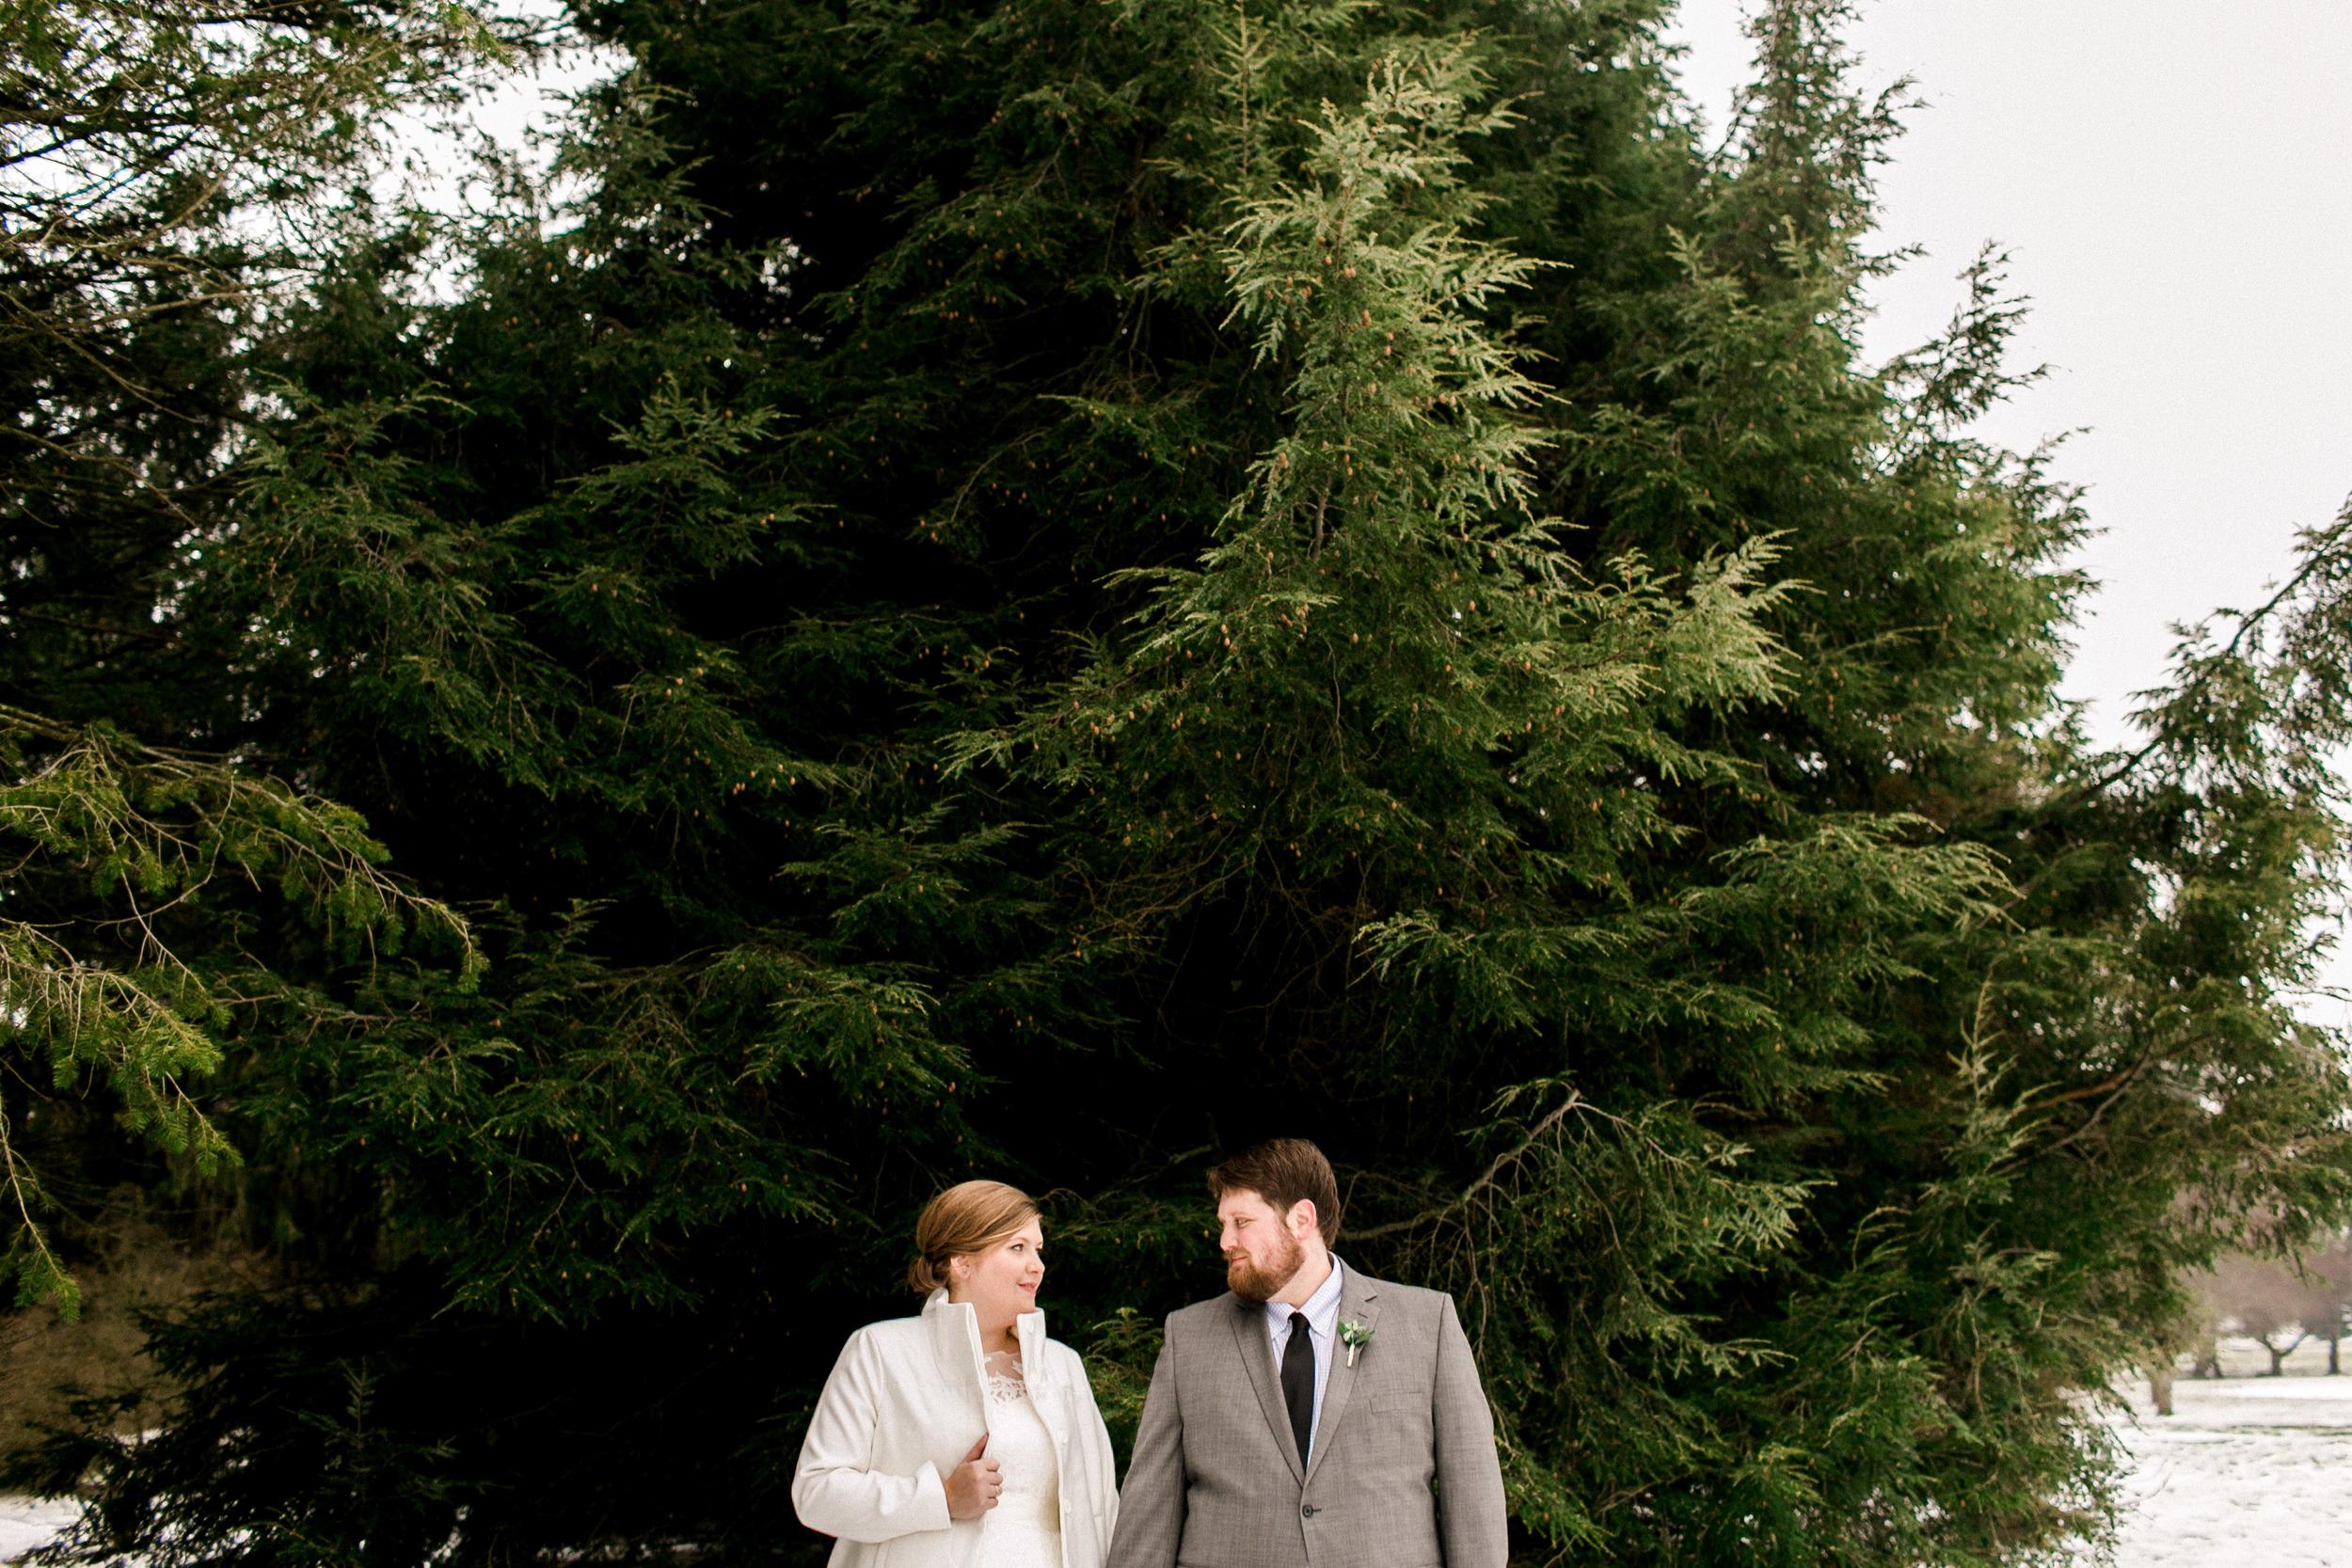 mayden photography_bridal portraits-40.jpg